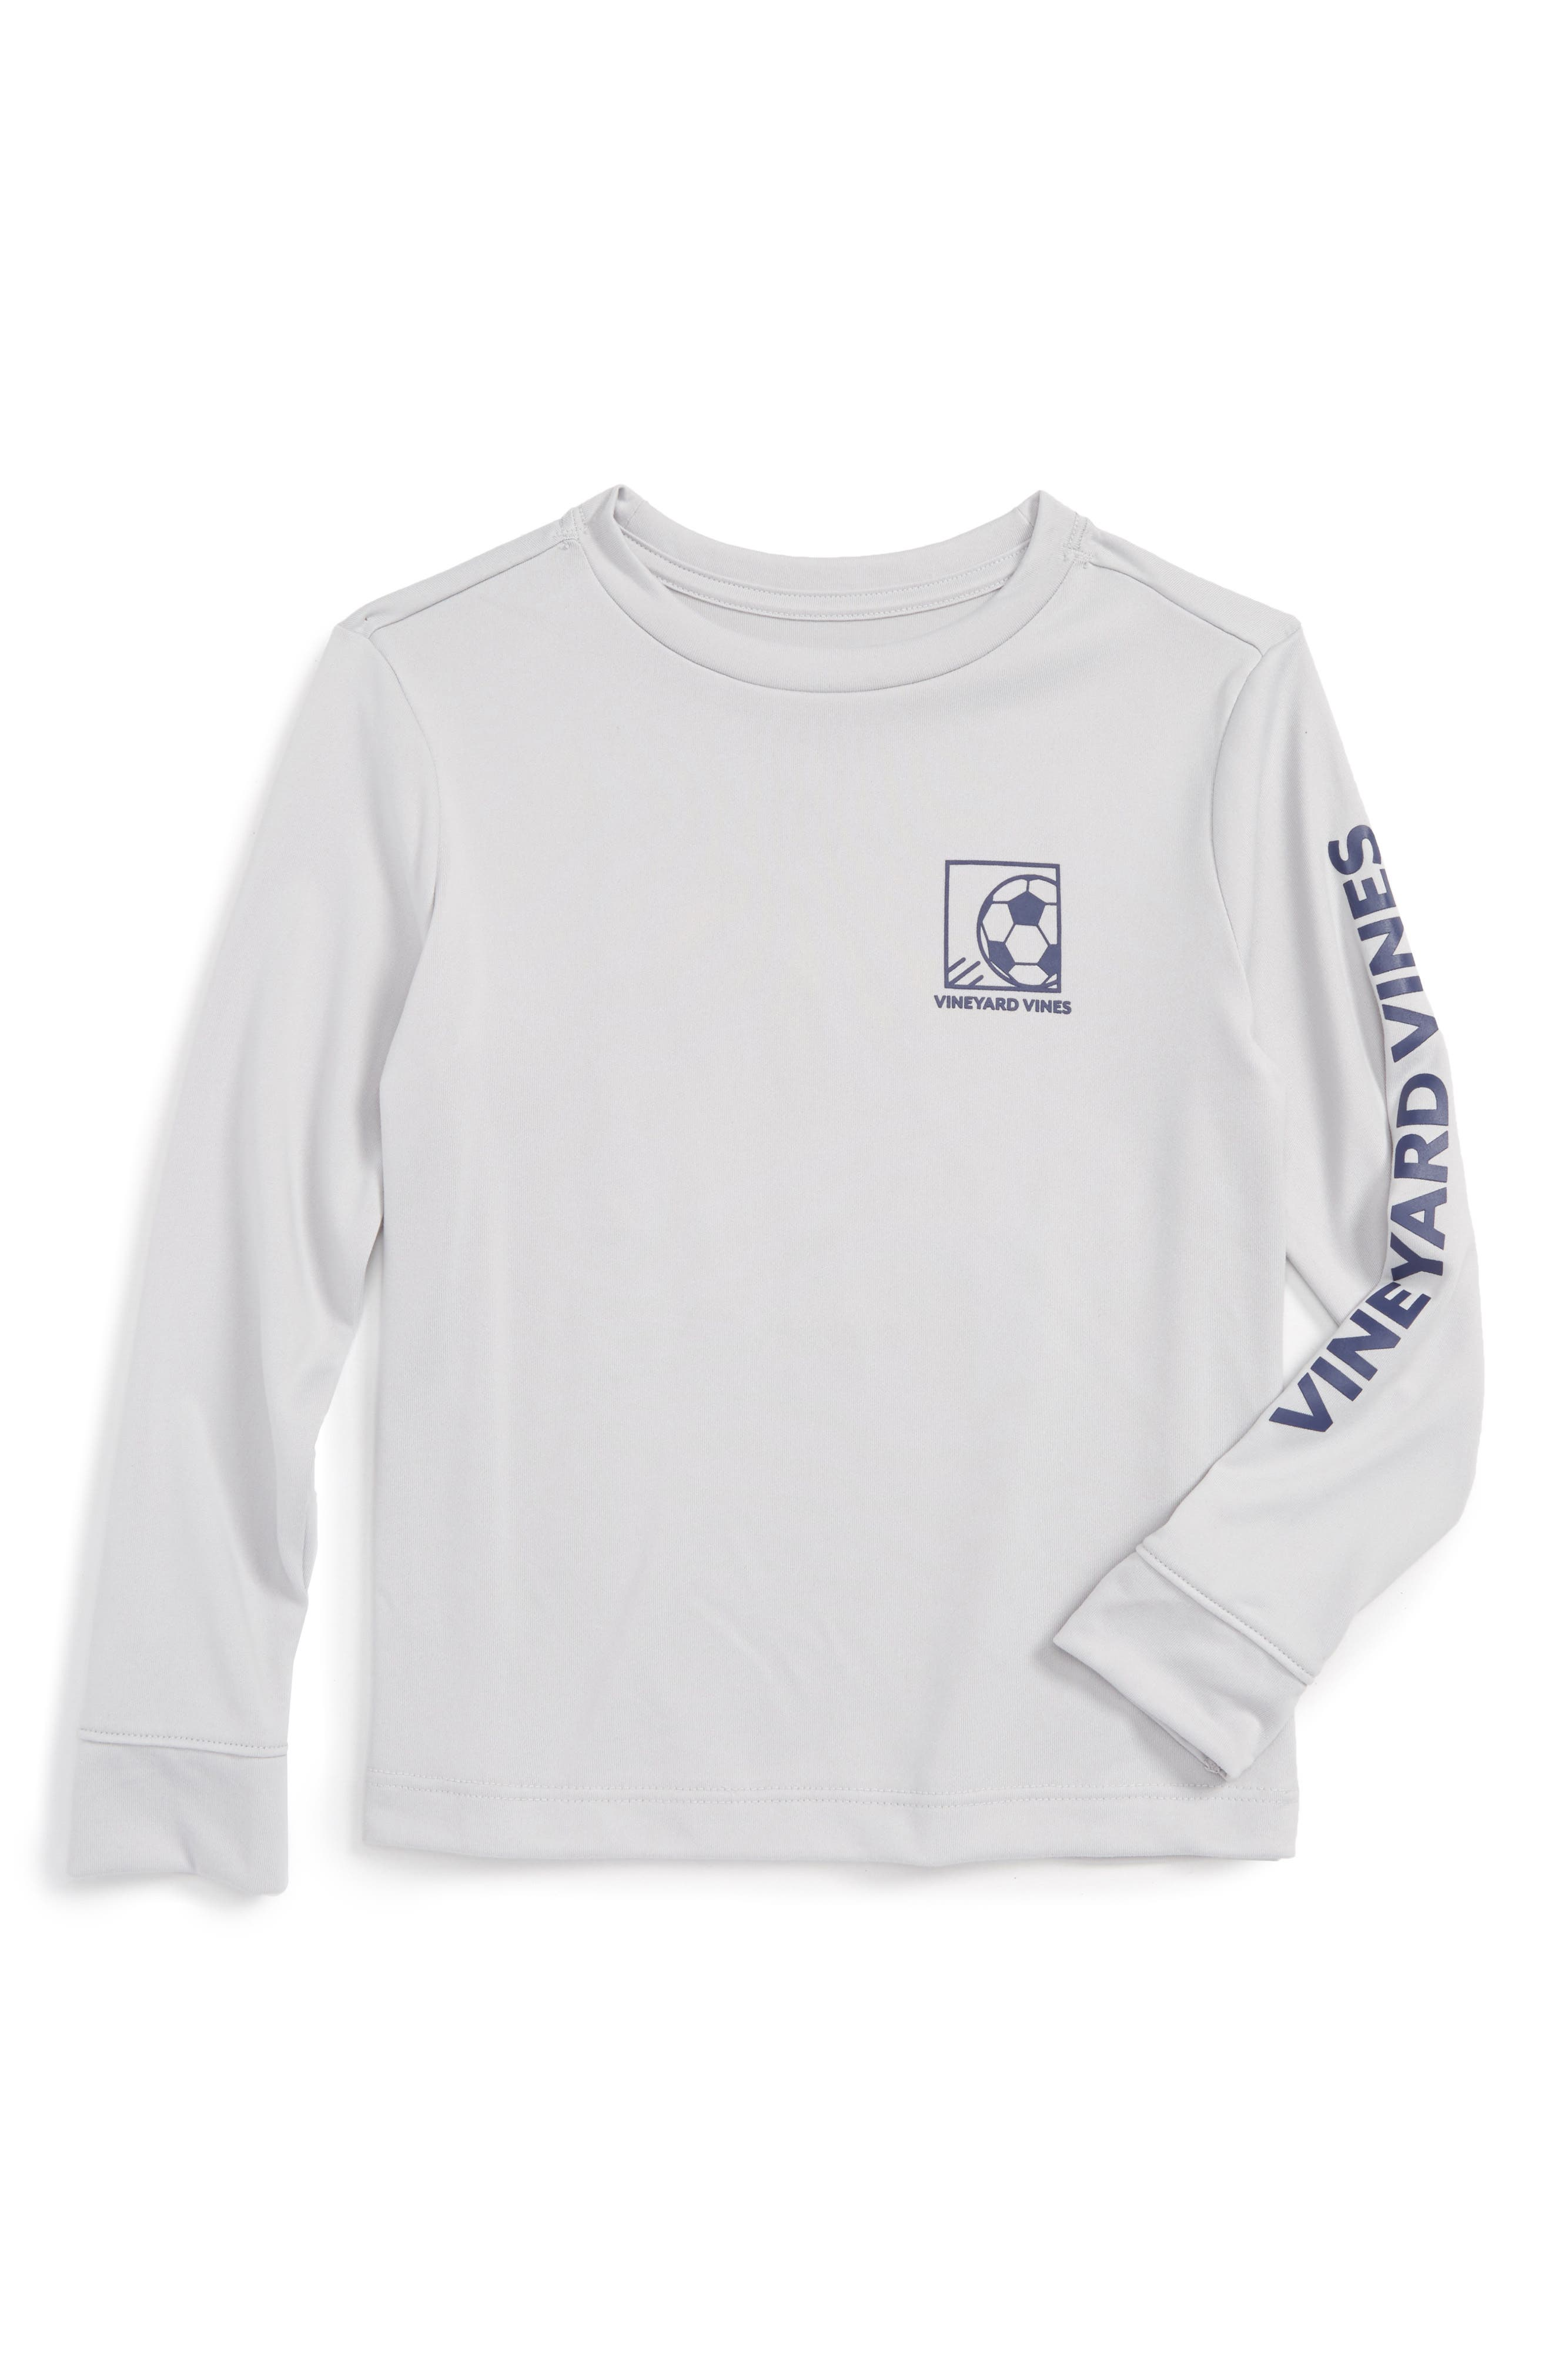 VINEYARD VINES,                             Soccer Box Performance T-Shirt,                             Alternate thumbnail 2, color,                             062